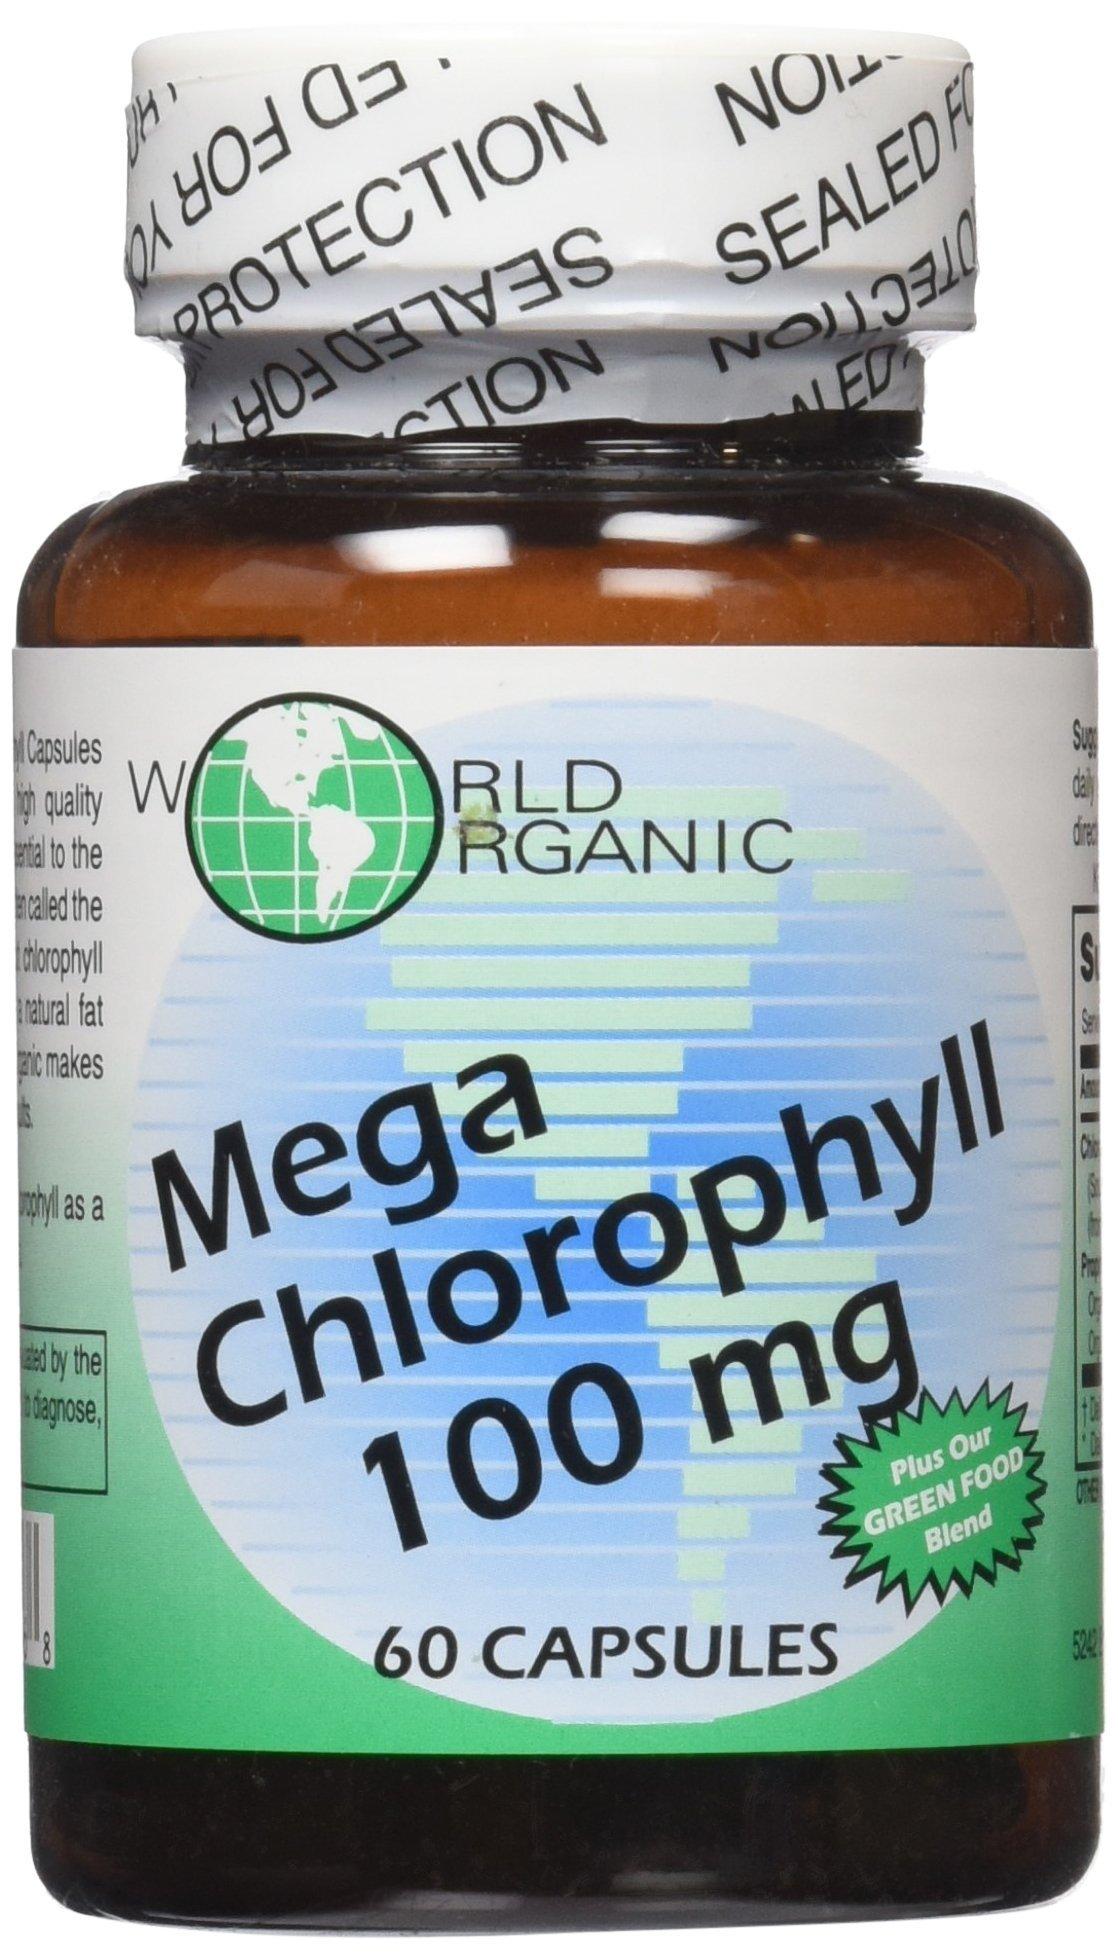 World Organic Mega Chlorophyll, 100 mg, Capsules, 60 capsules